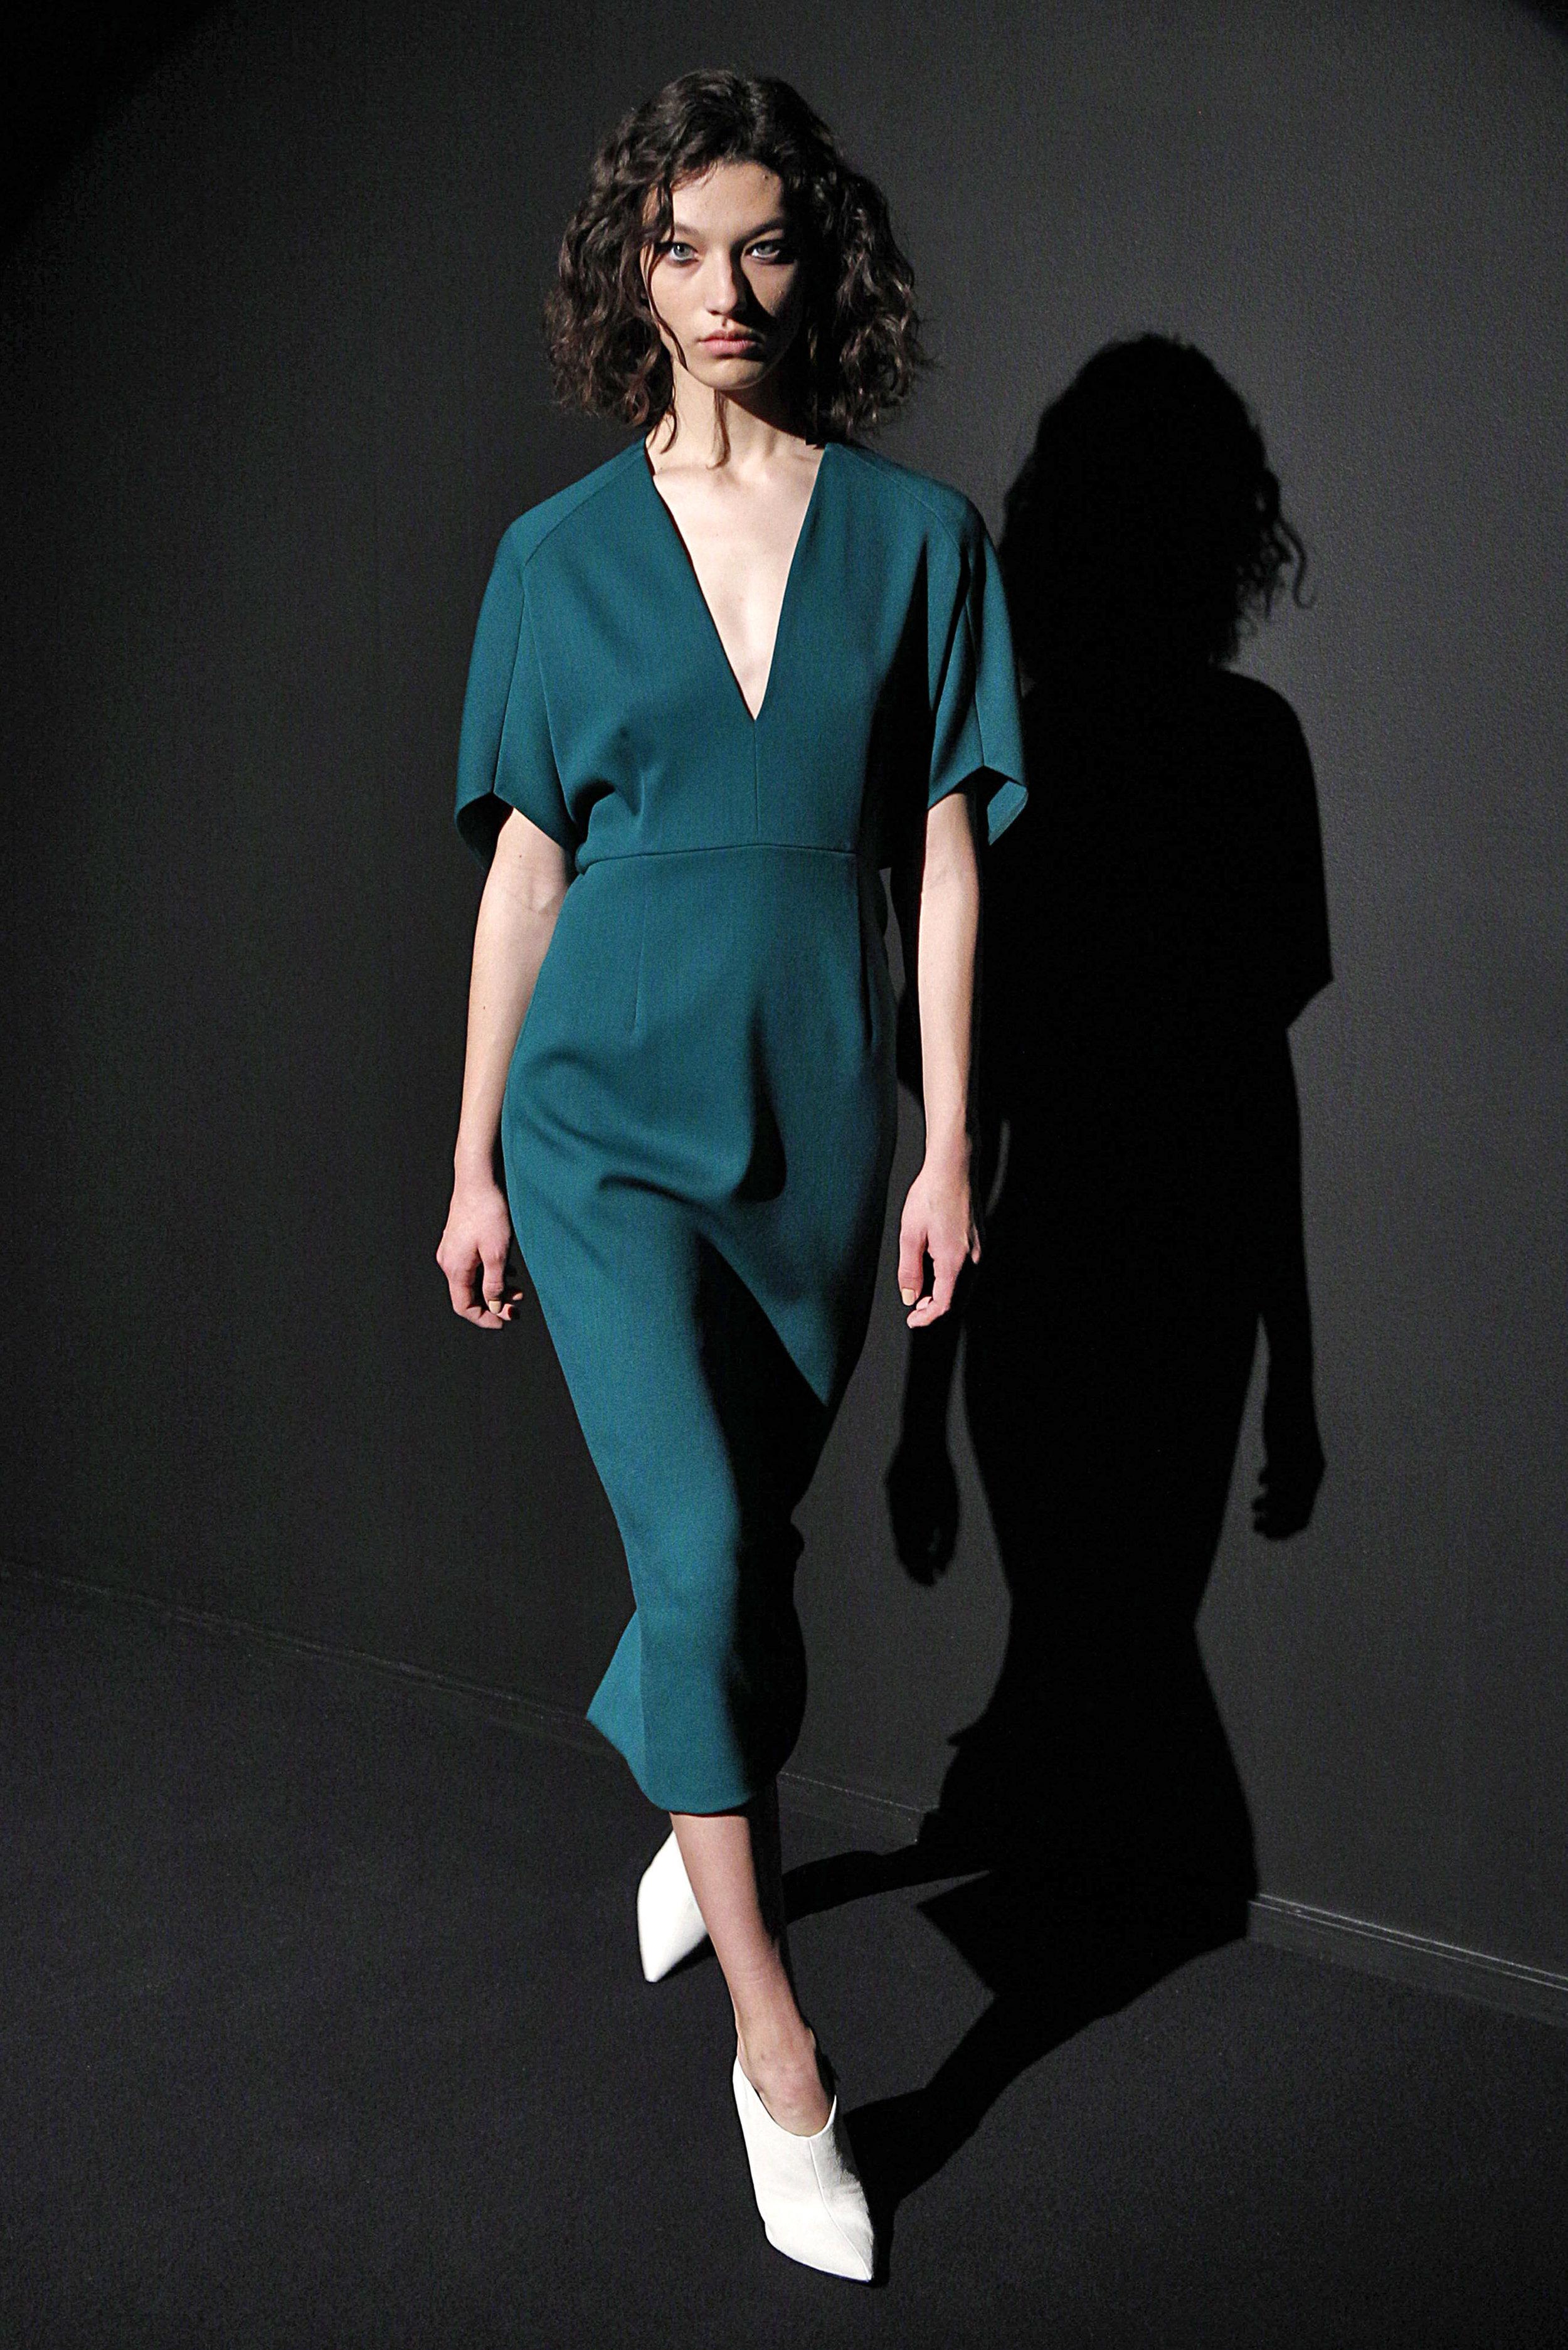 Look 15 Sea green wool barathea dress.